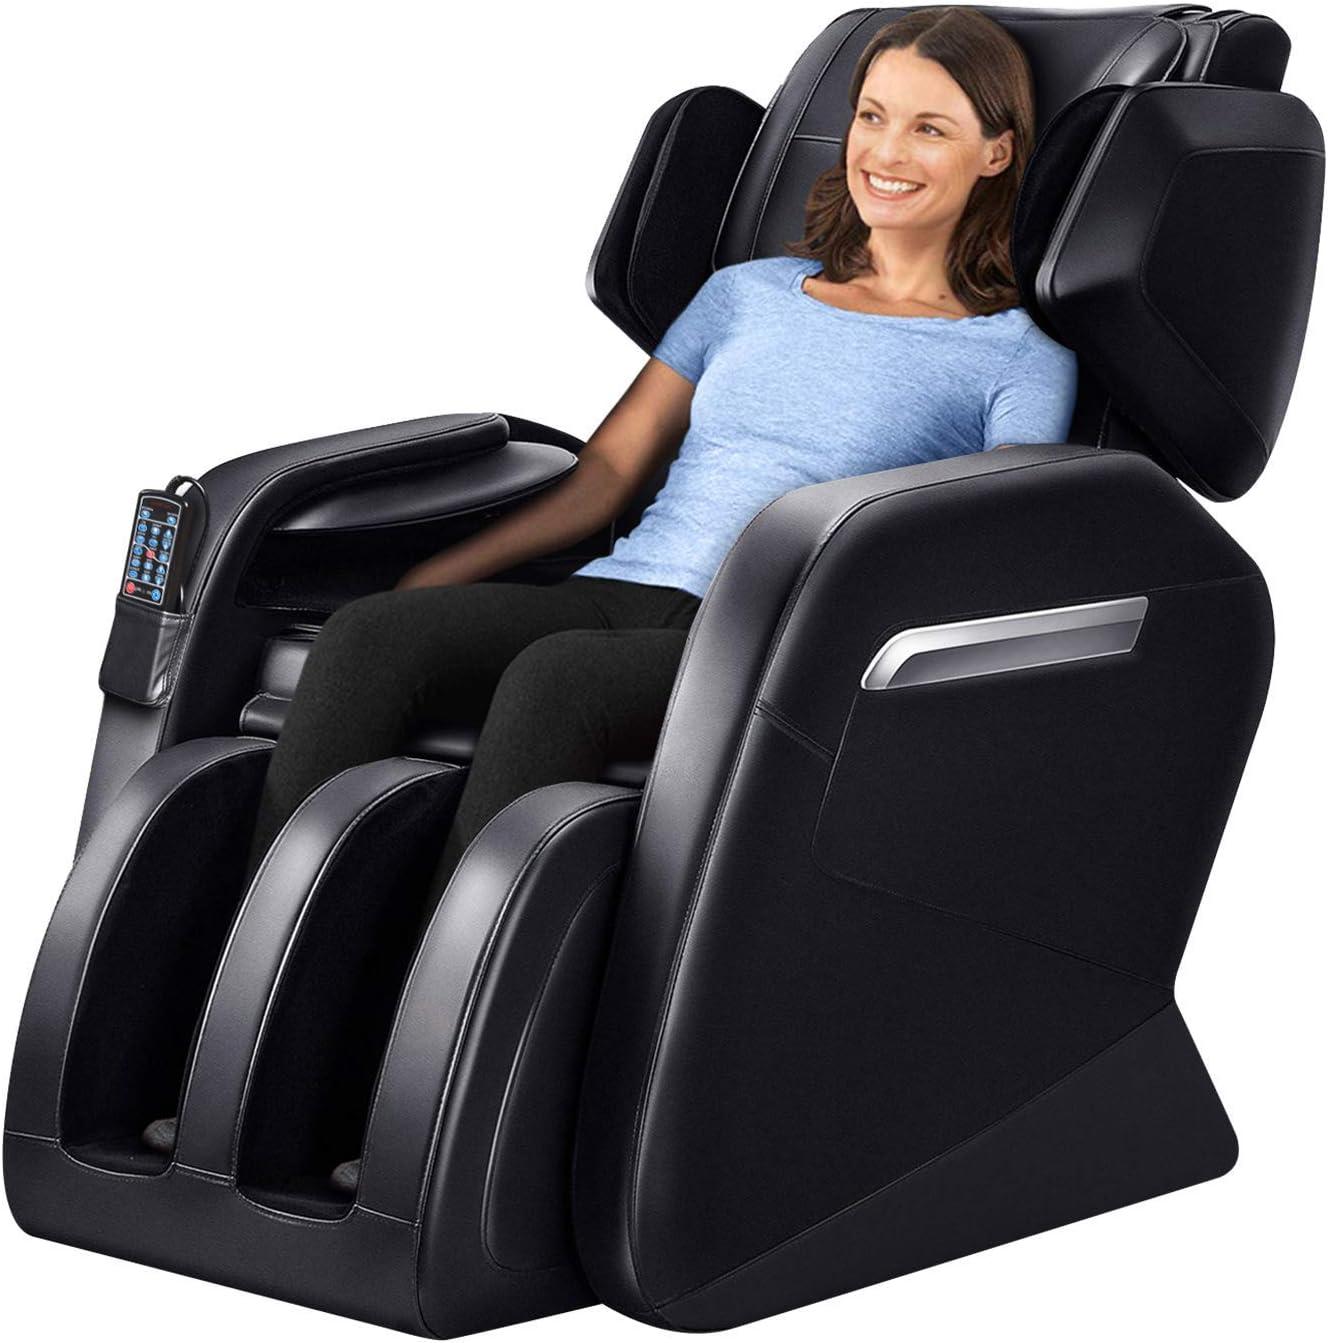 Massage Chair Recliner, Zero Gravity Full Body Shiatsu Luxurious Electric Massage Chair